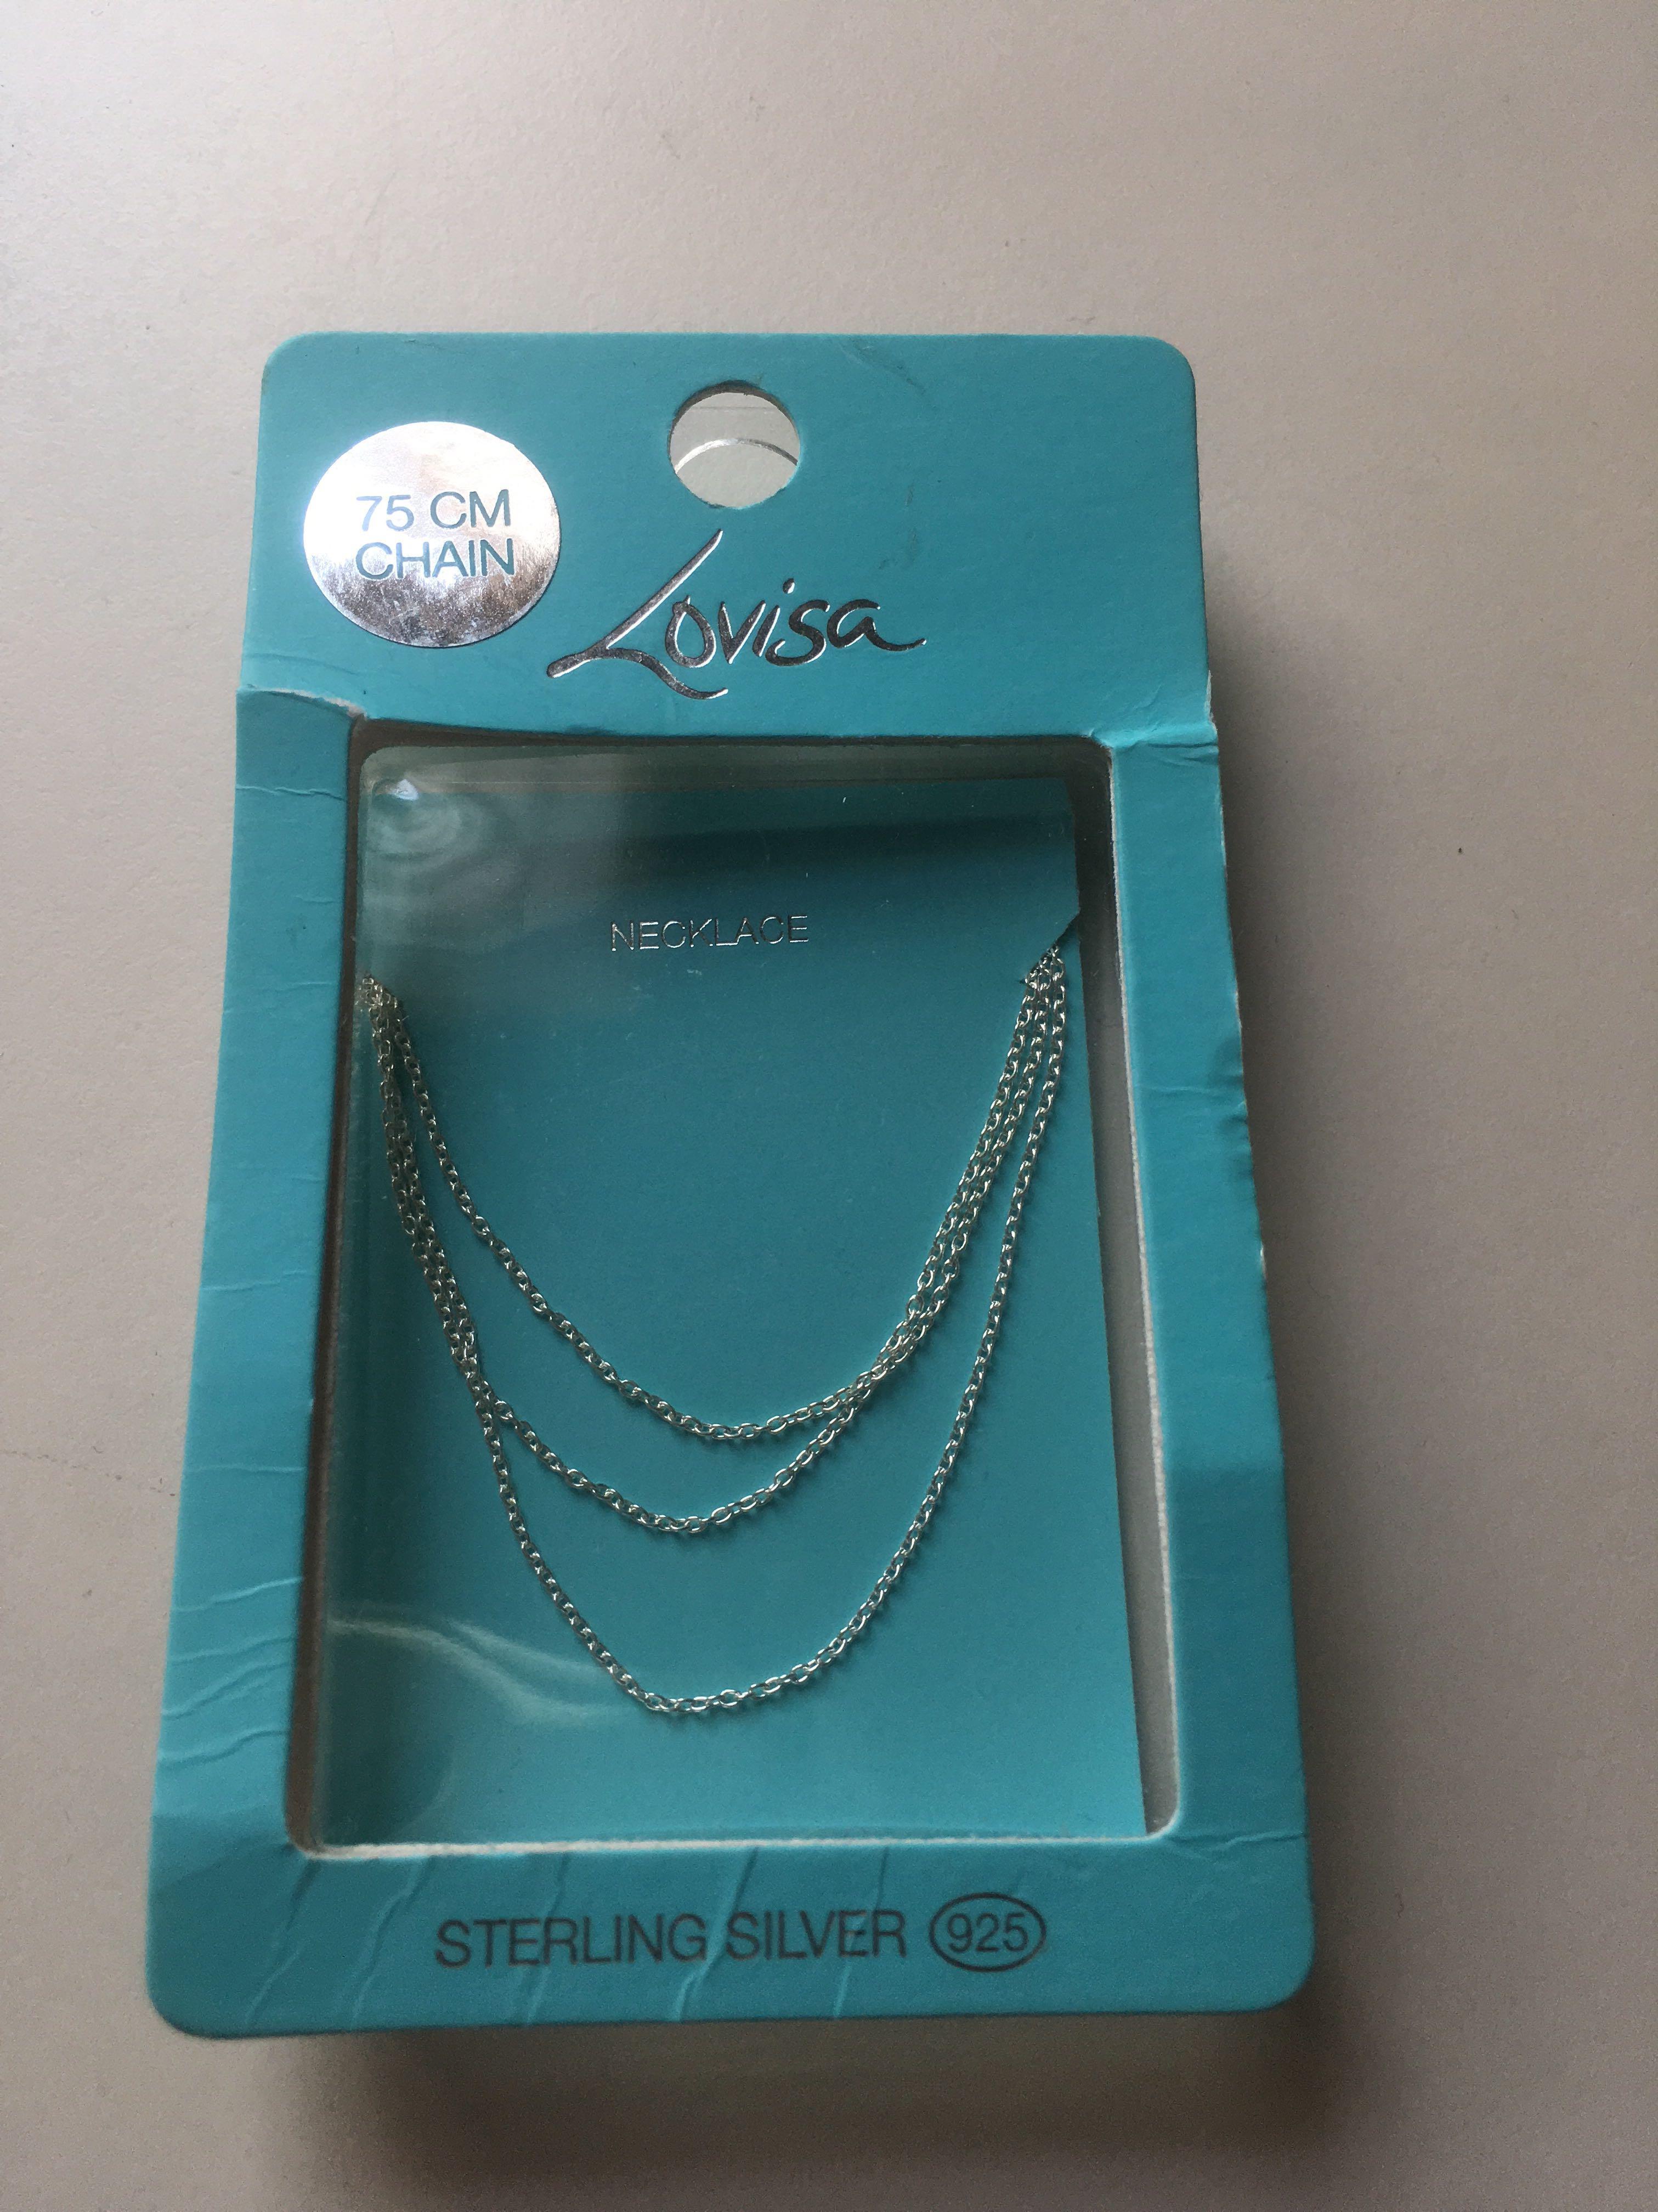 Lovisa Silver Chain